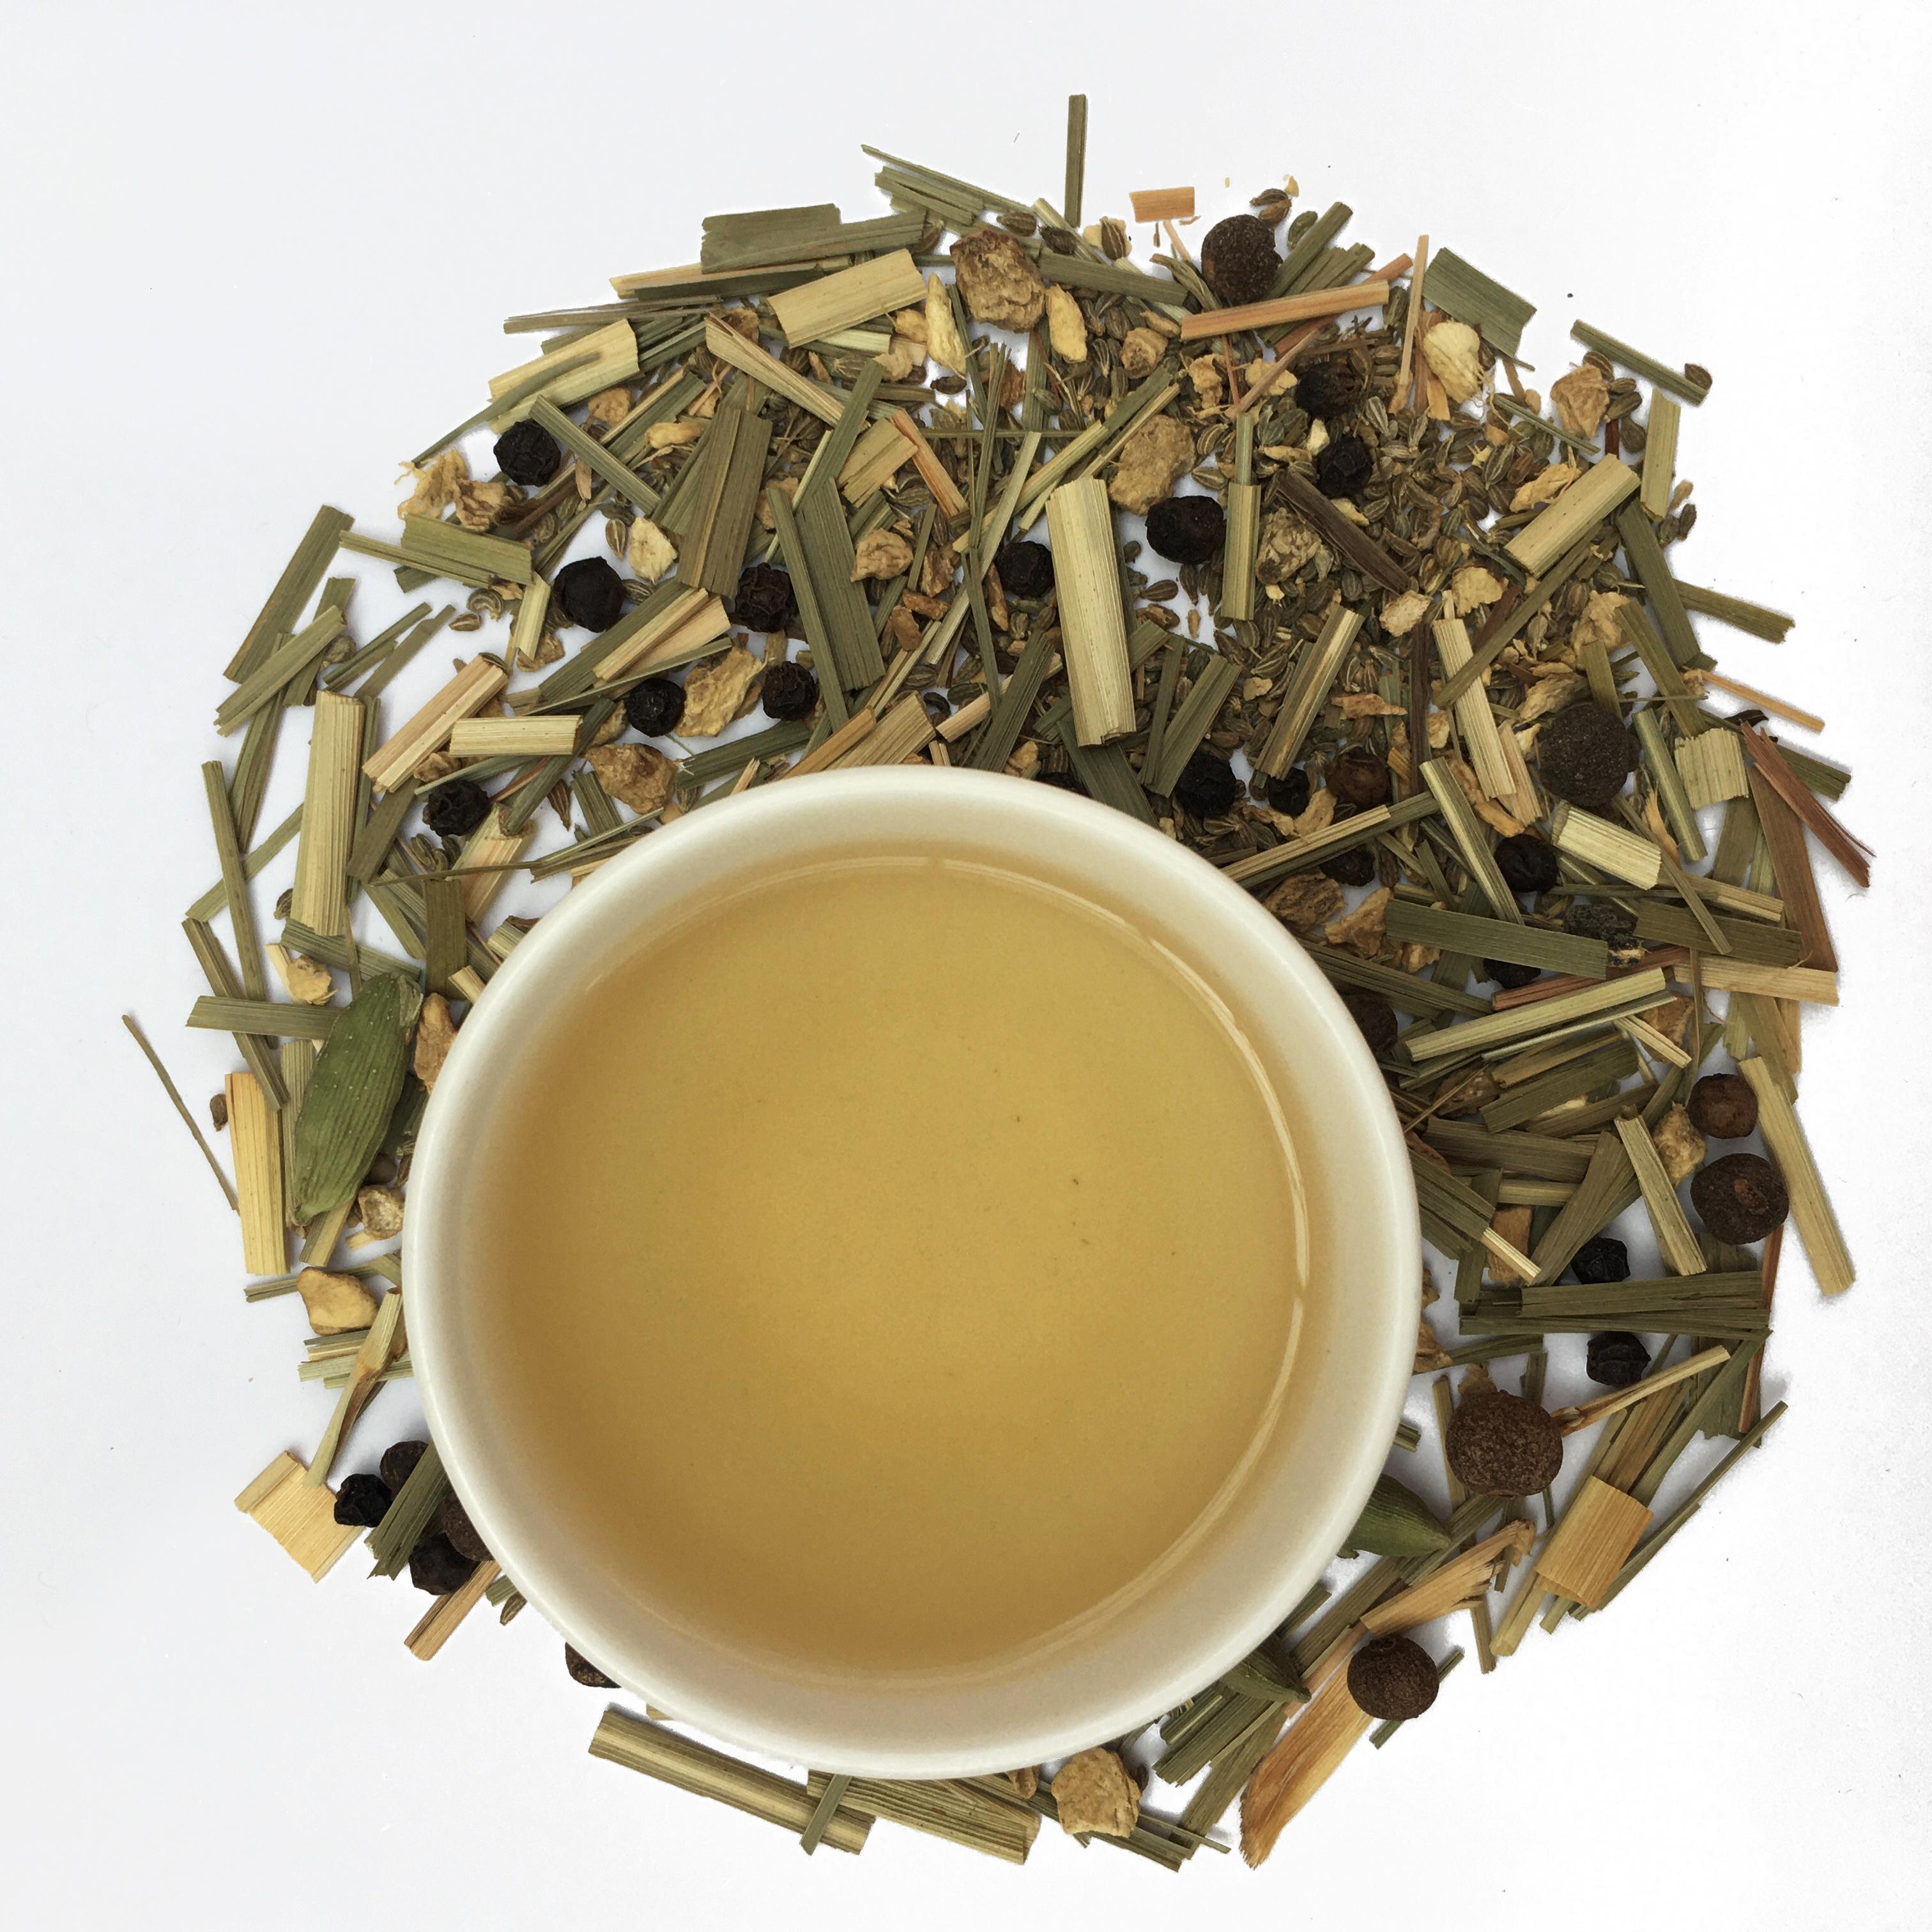 Tummy Tea Herbal Blend (Organic)